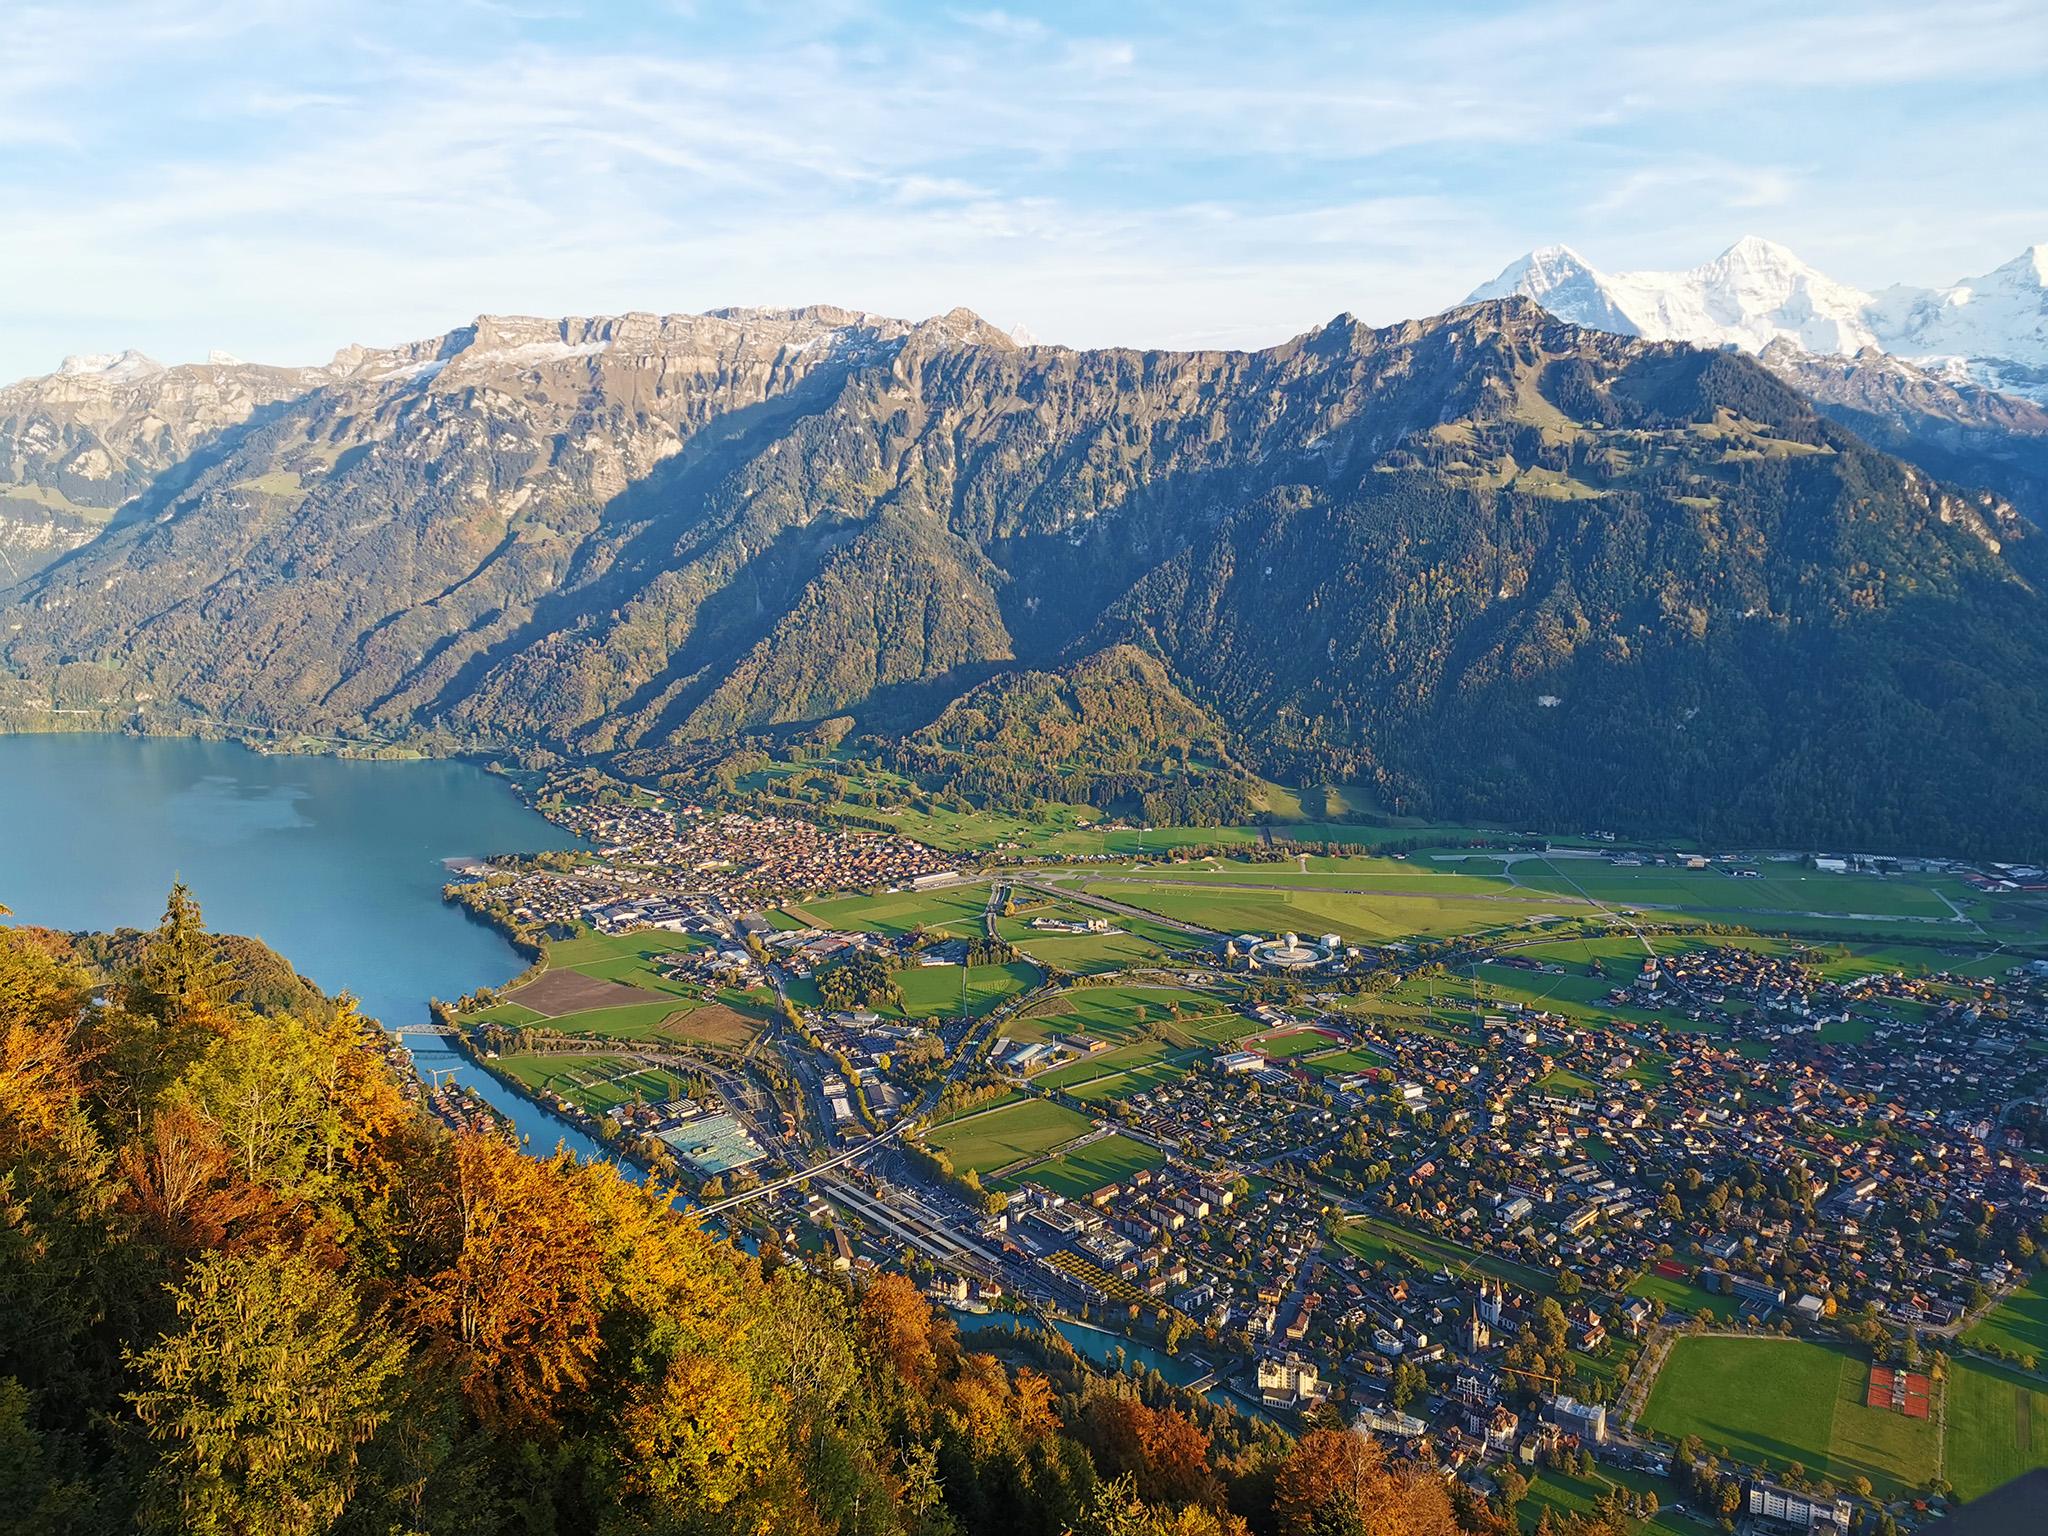 kt_2020_360_Keytours_excursions_Swisstours_interlaken_village8_2048_10